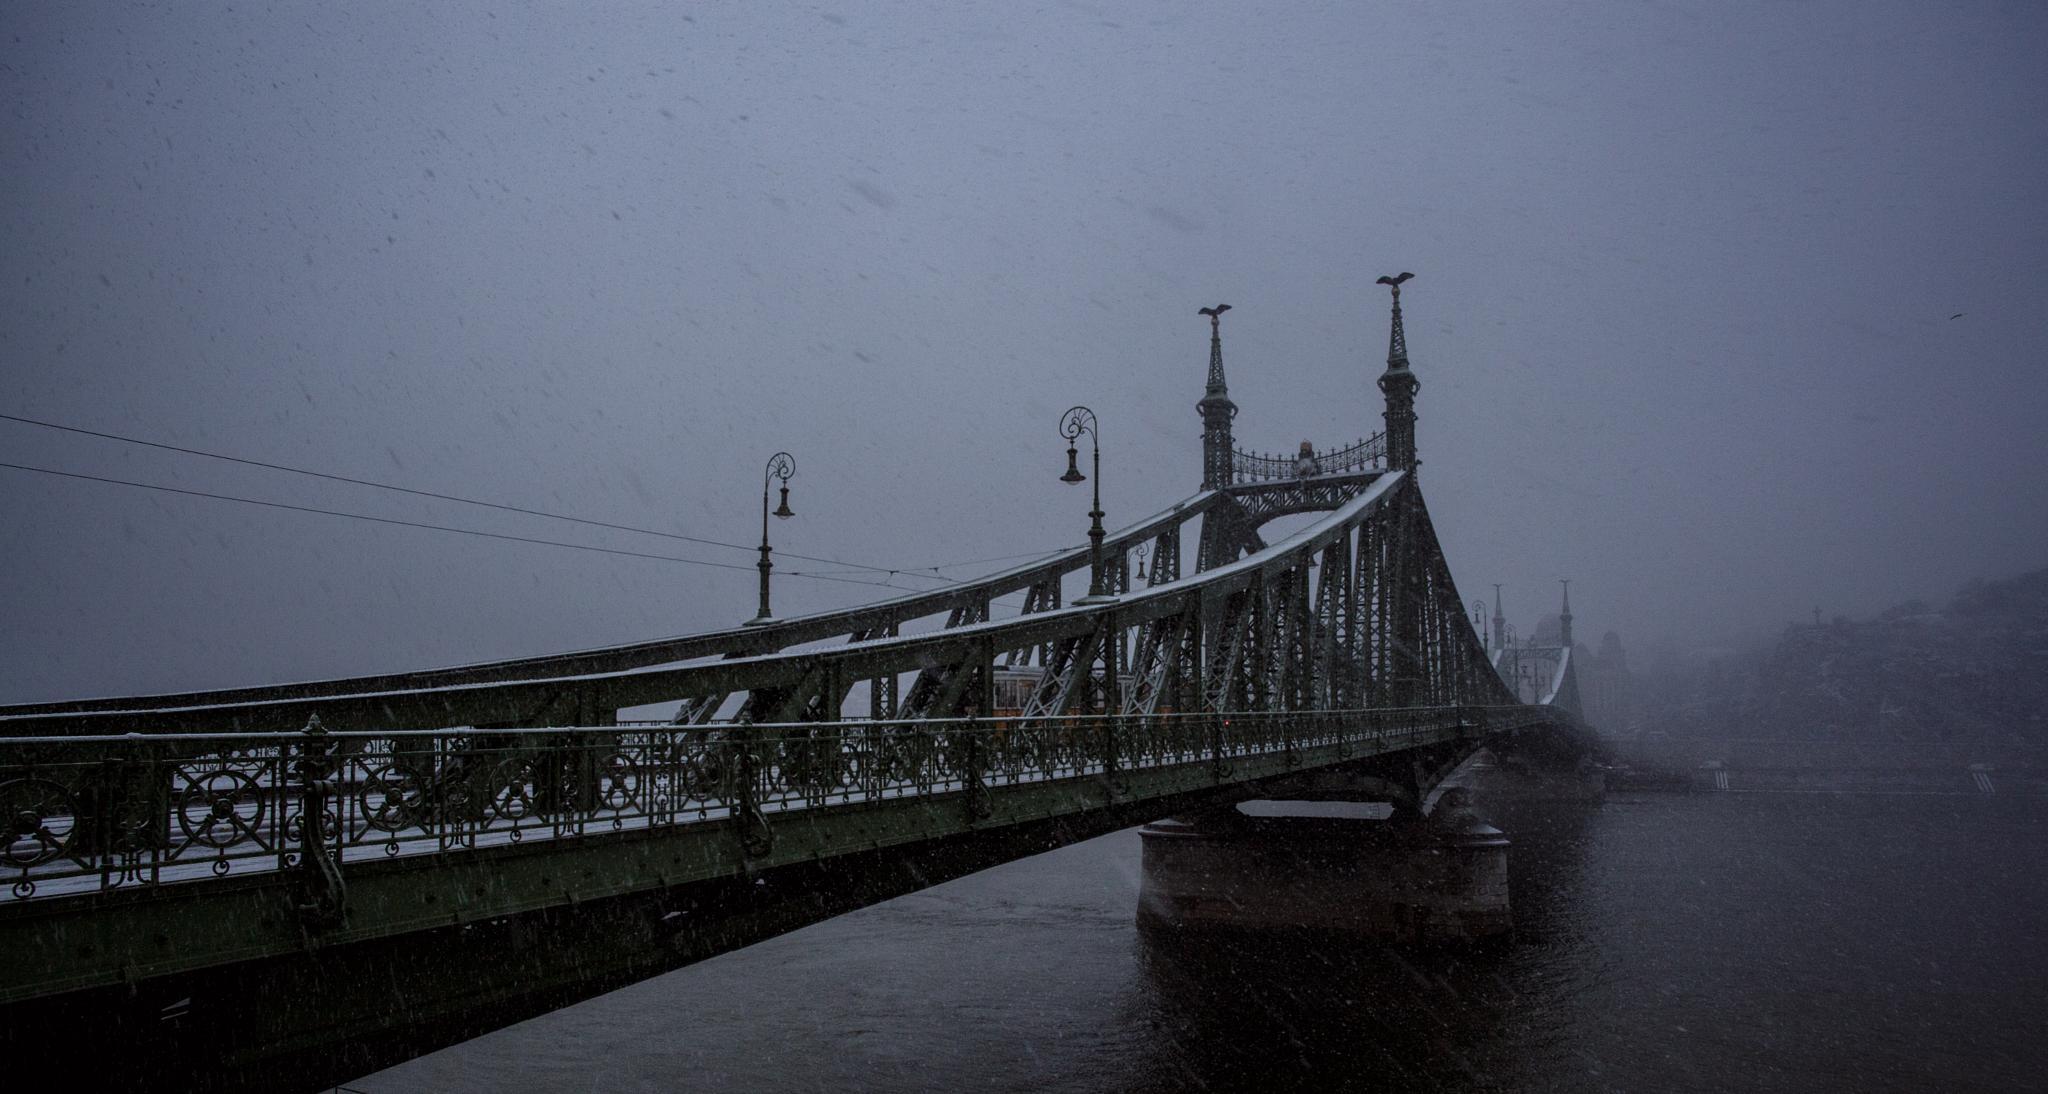 Snow over the bridge by Matej Kmet